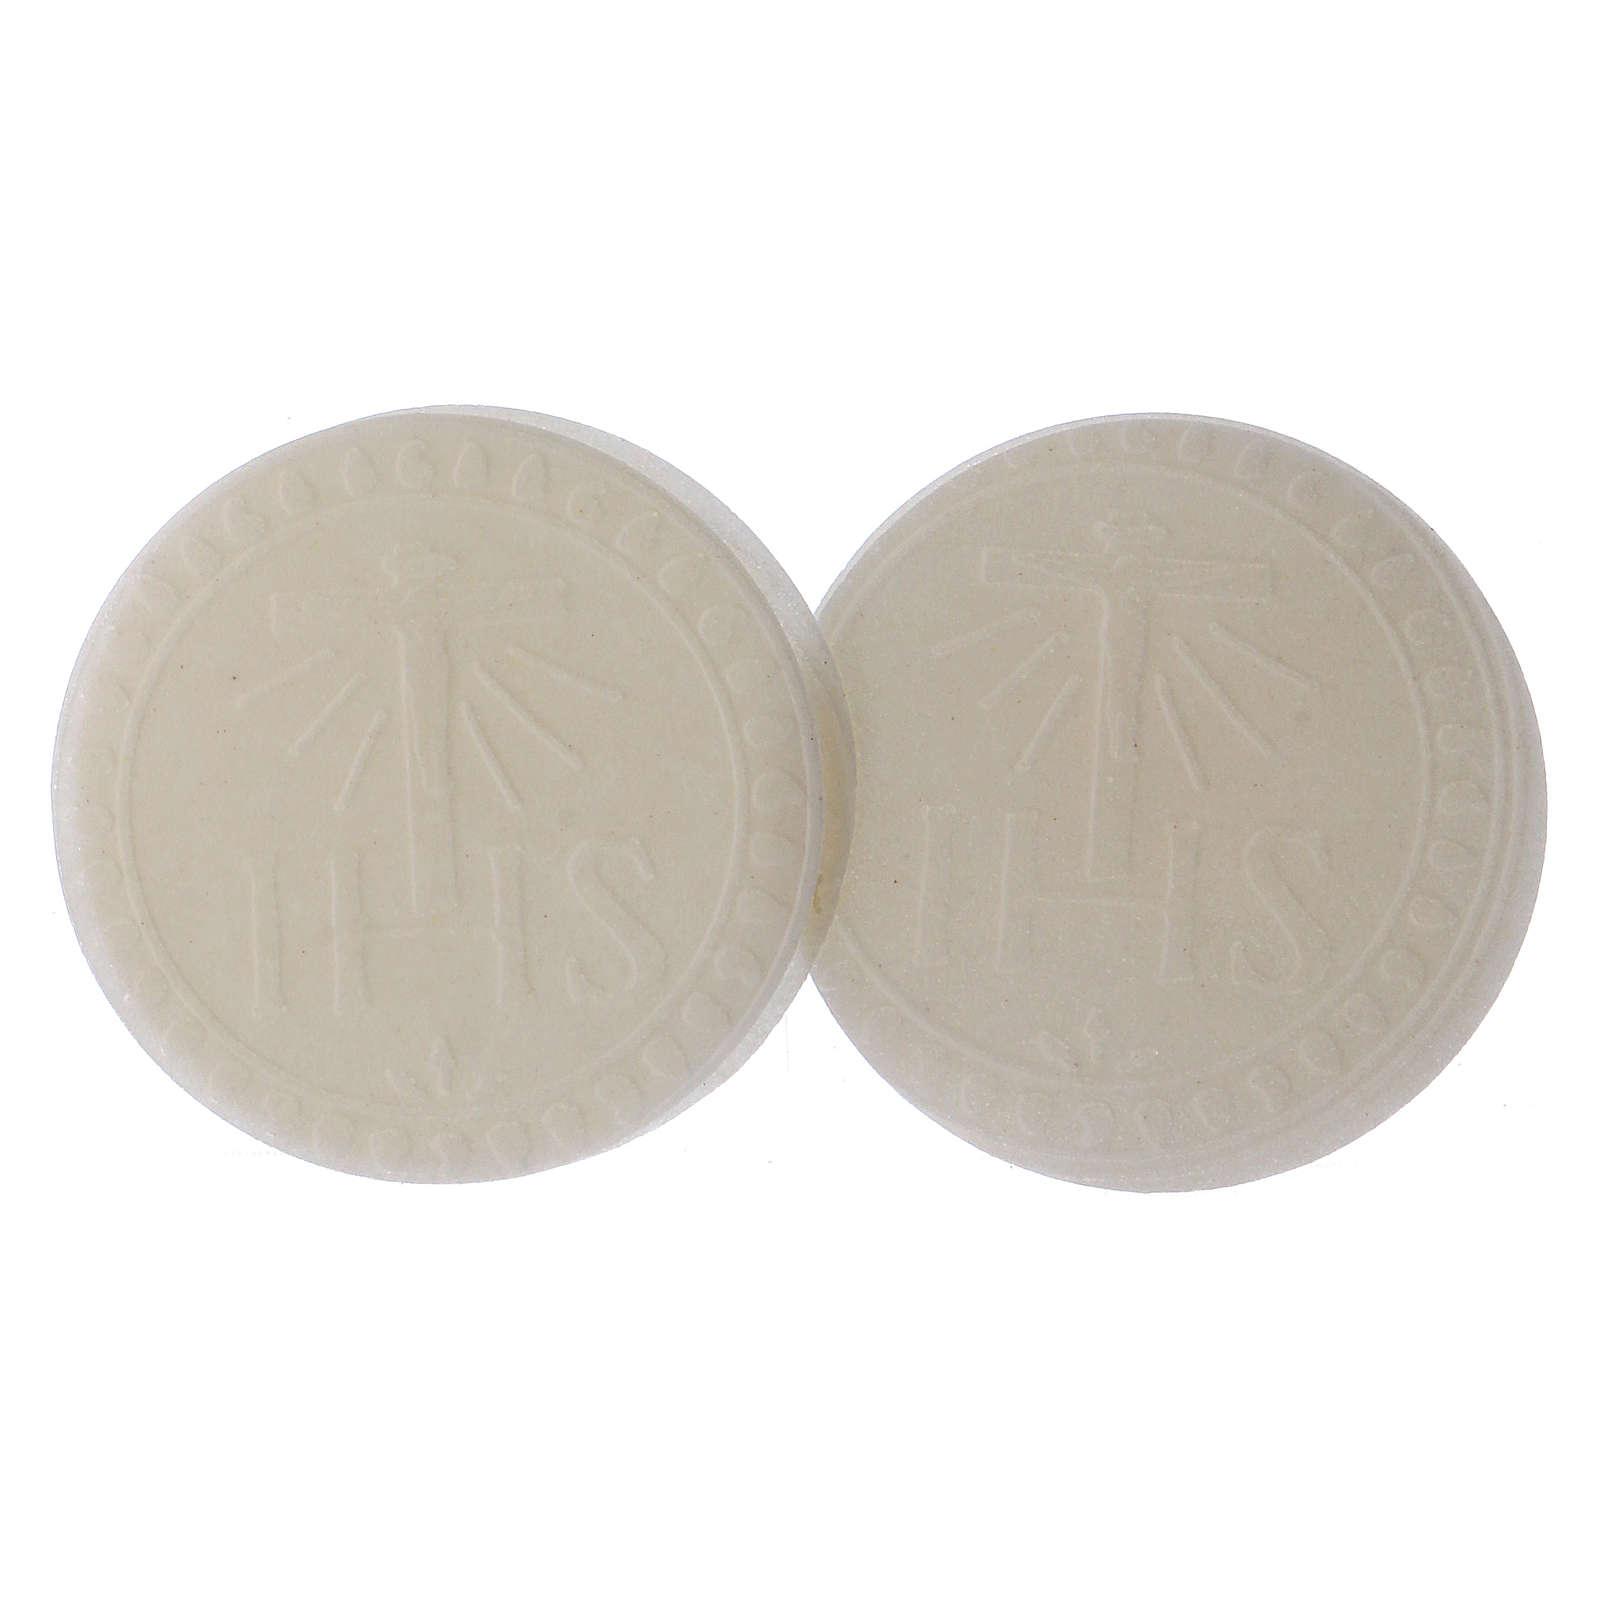 Ostia basso contenuto di glutine celiaci 75 mm 3